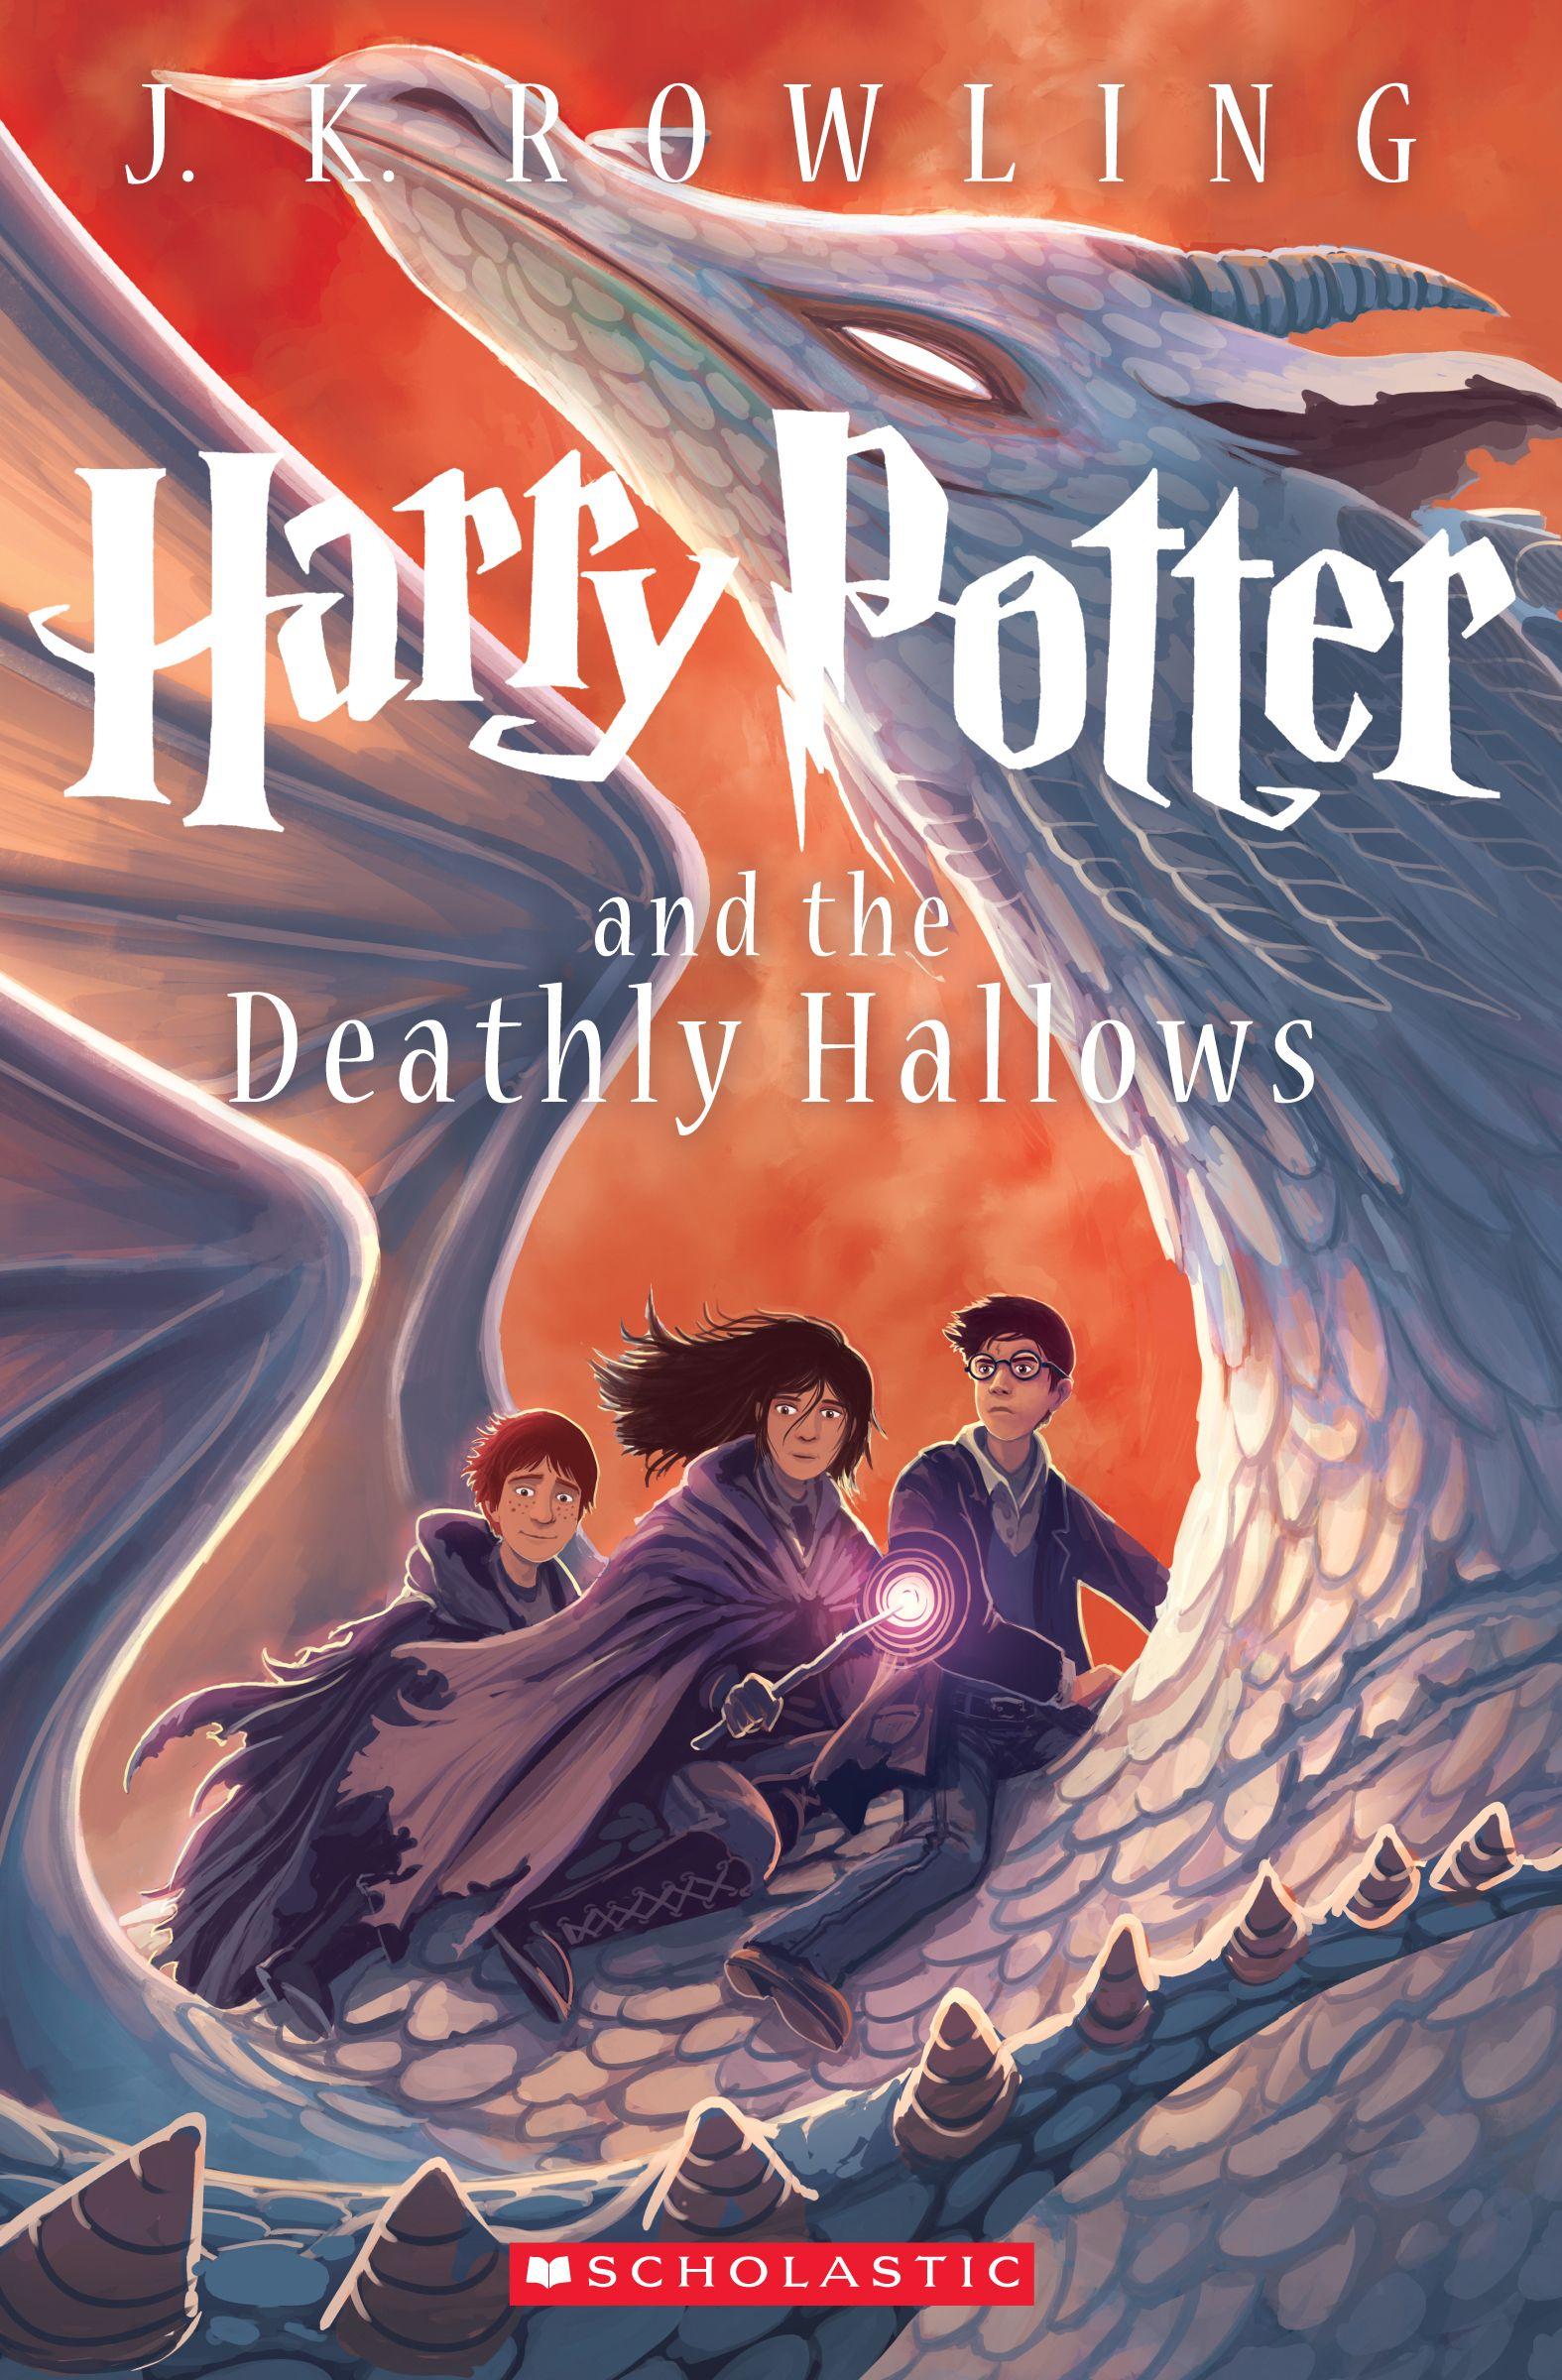 New Scholastic Cover Harry Potter Books Pinterest Harry Potter